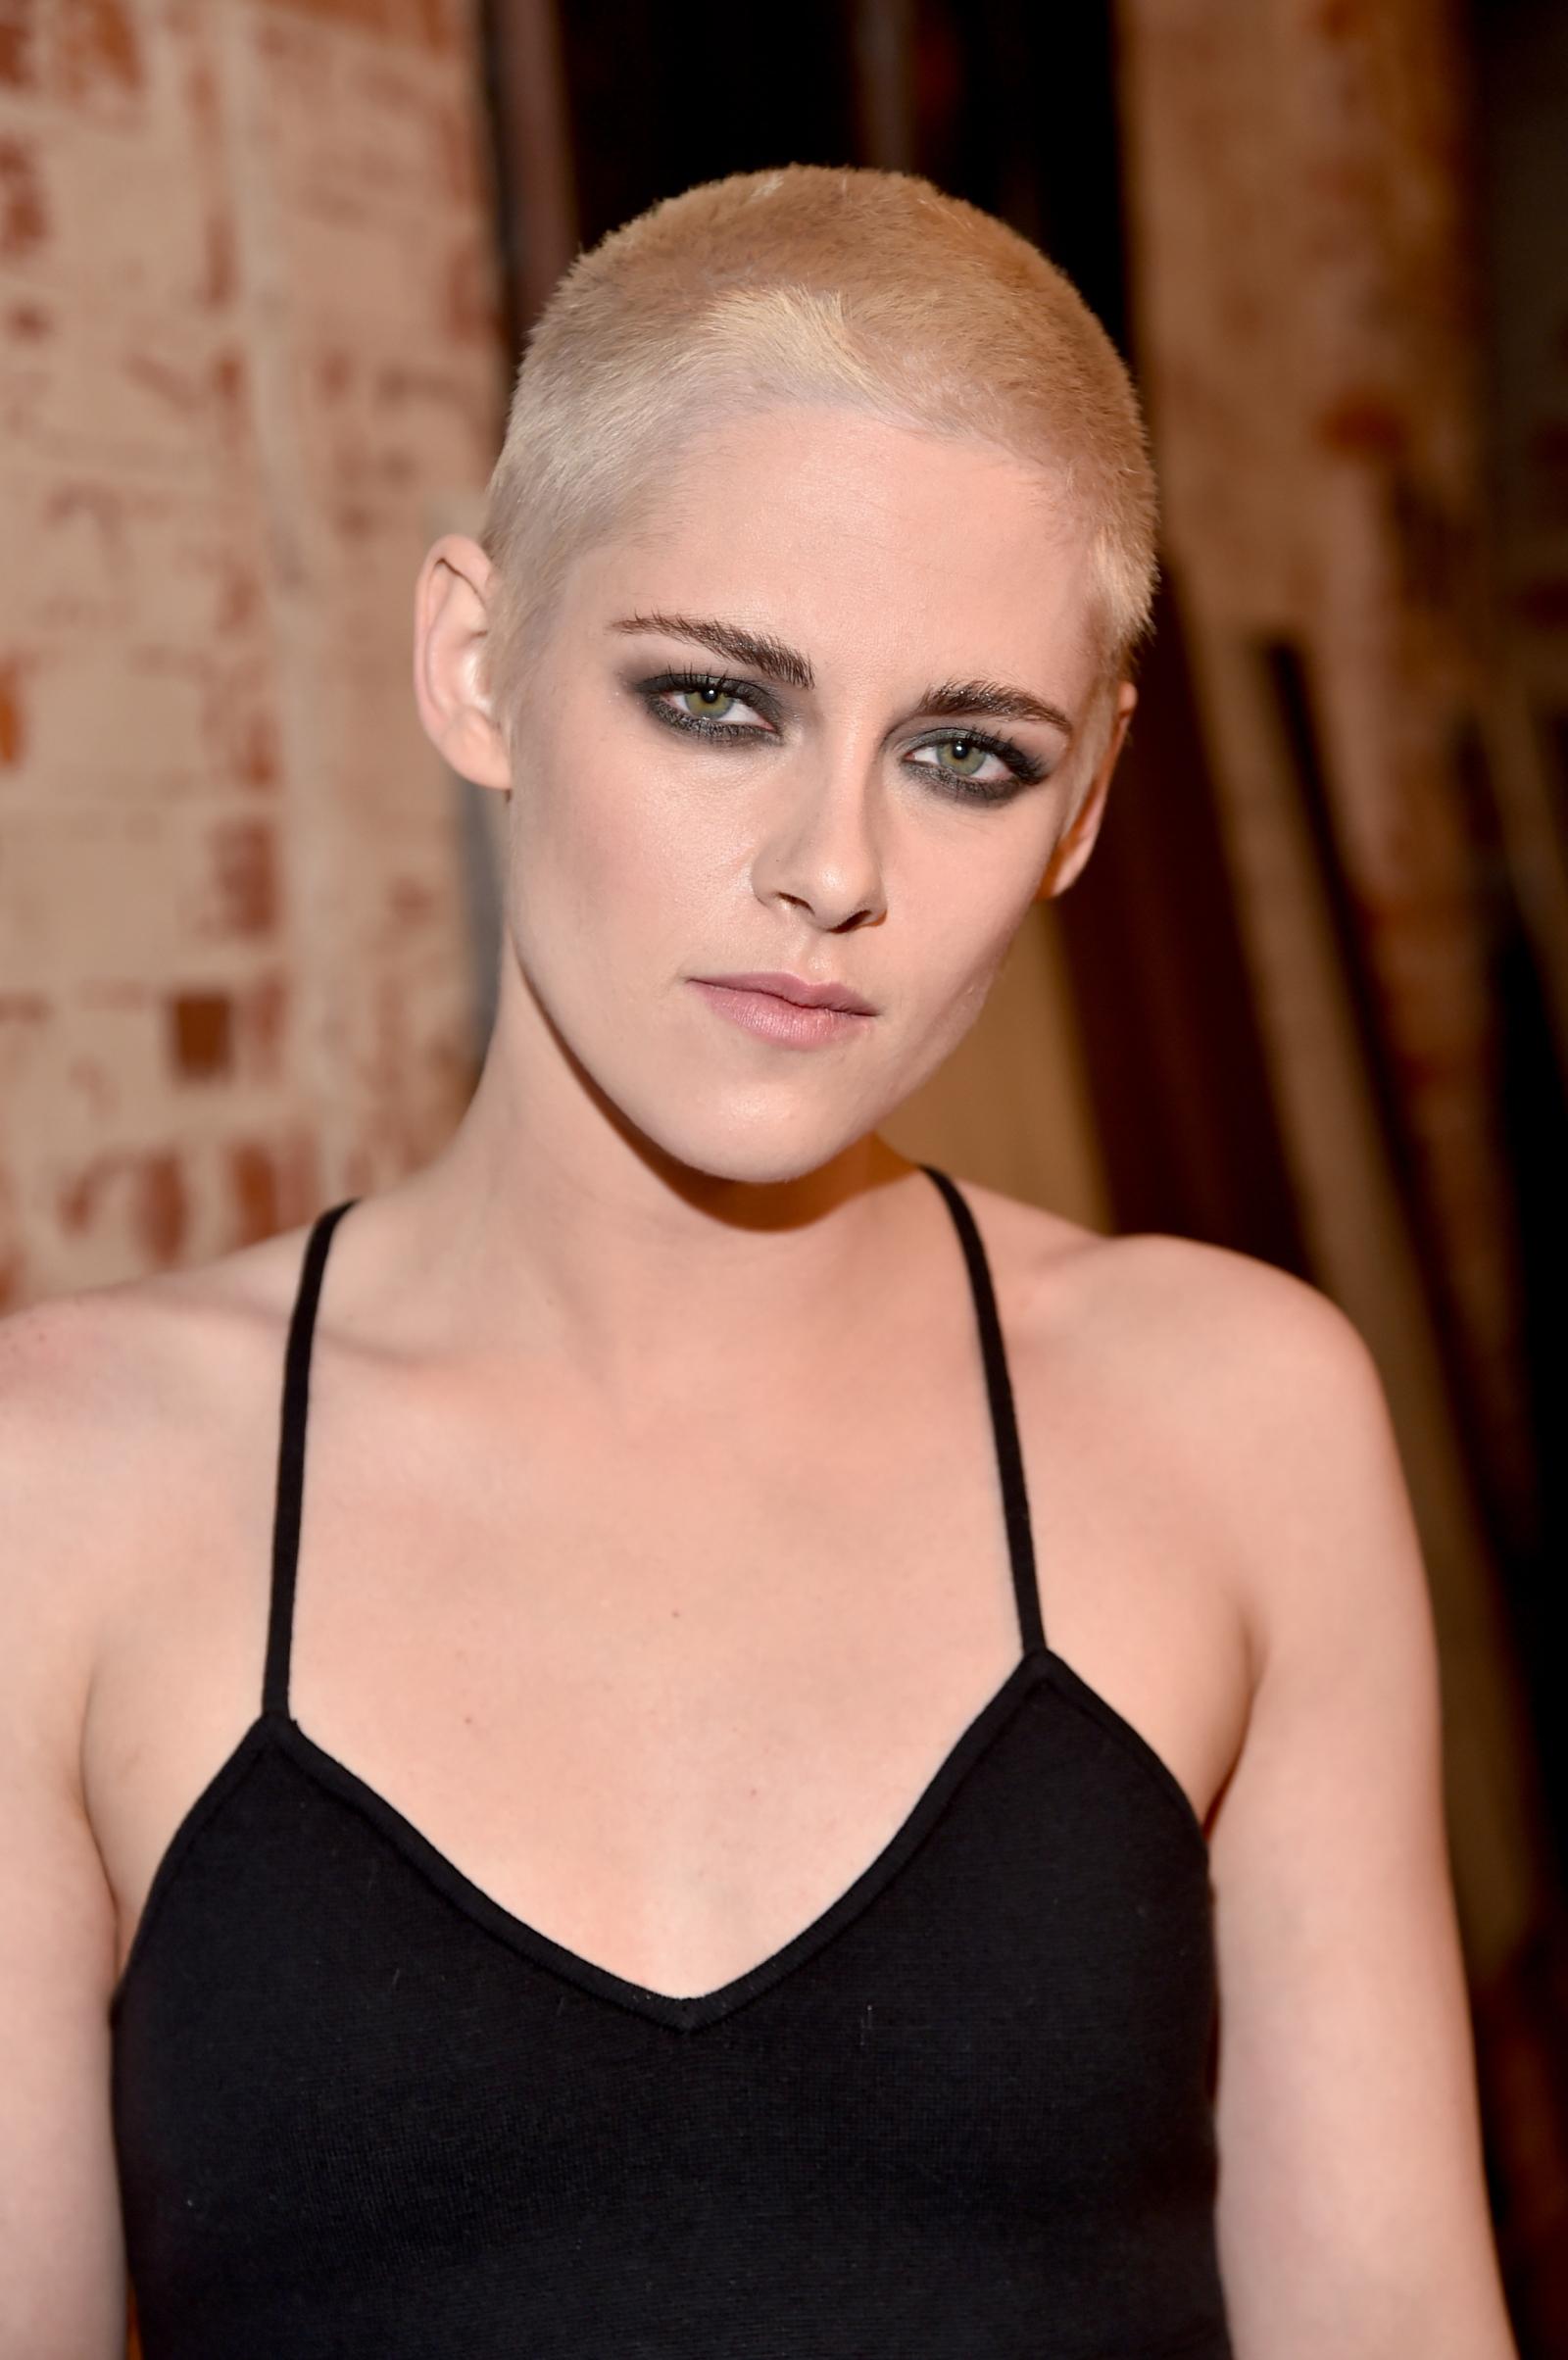 Robert Pattinson 'loves' Kristen Stewart's new look ...